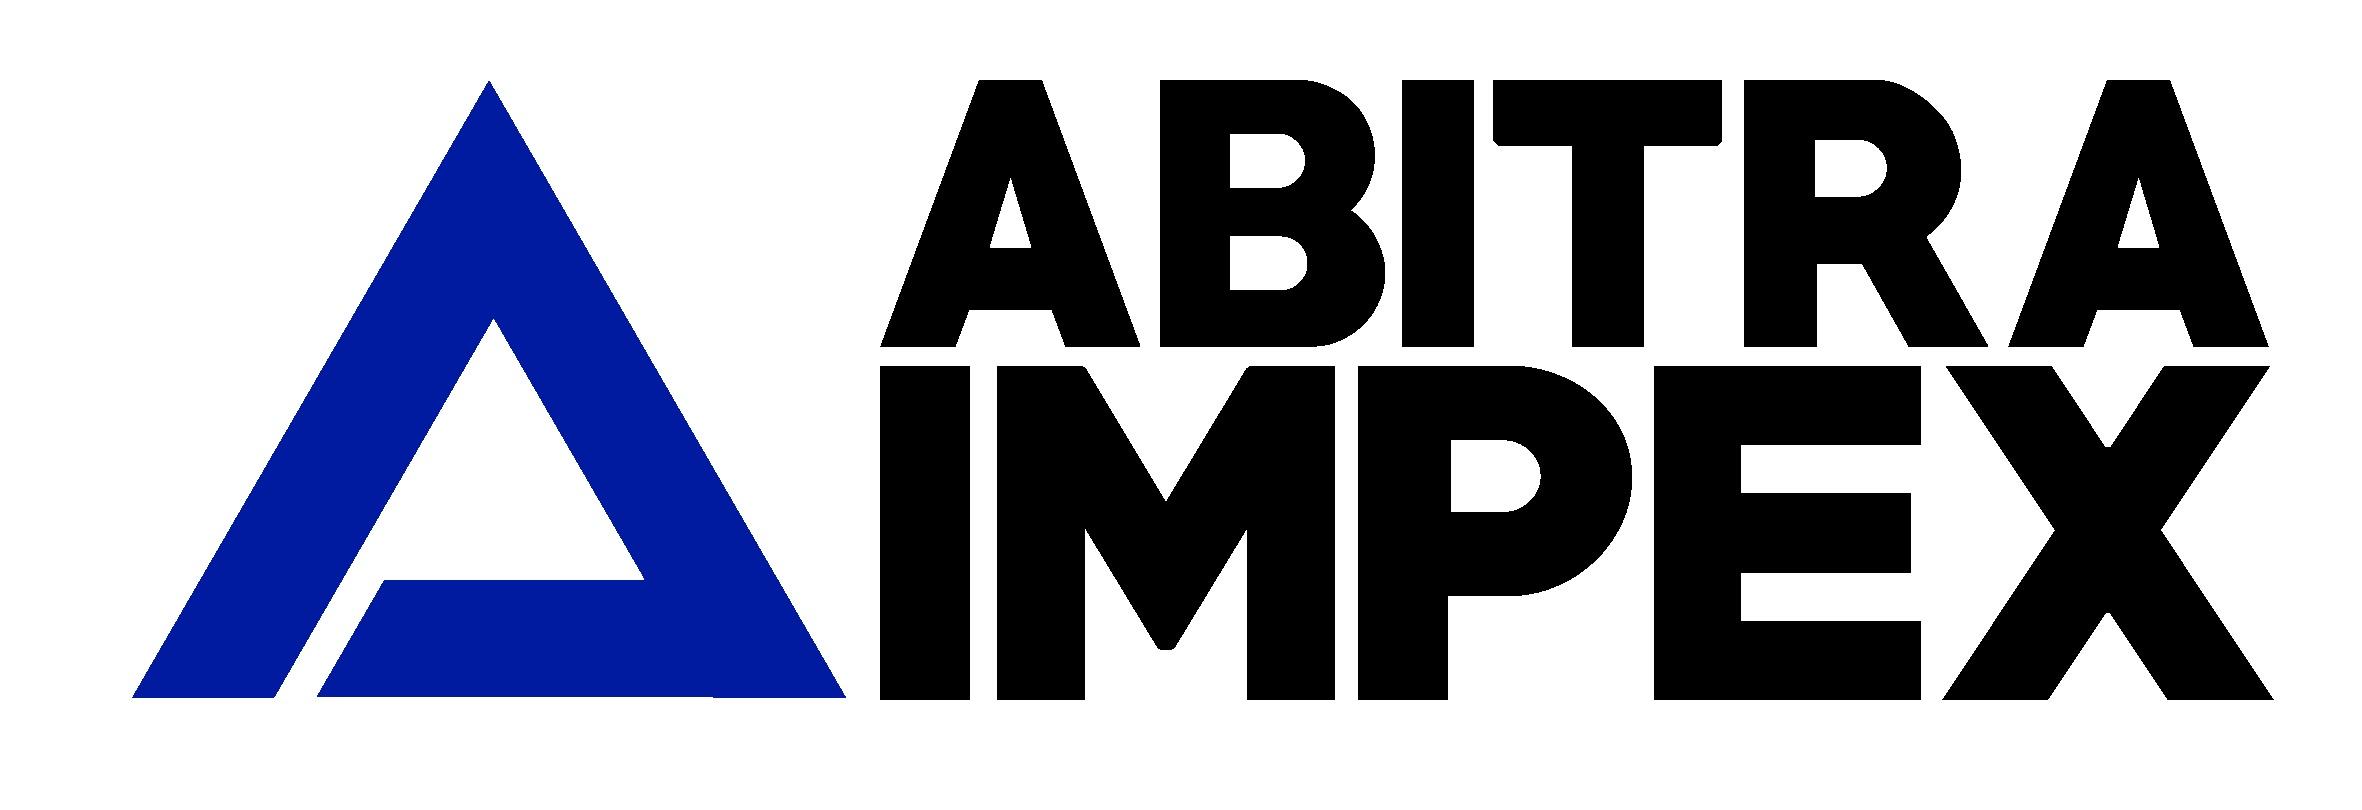 ABITRA IMPEX GmbH